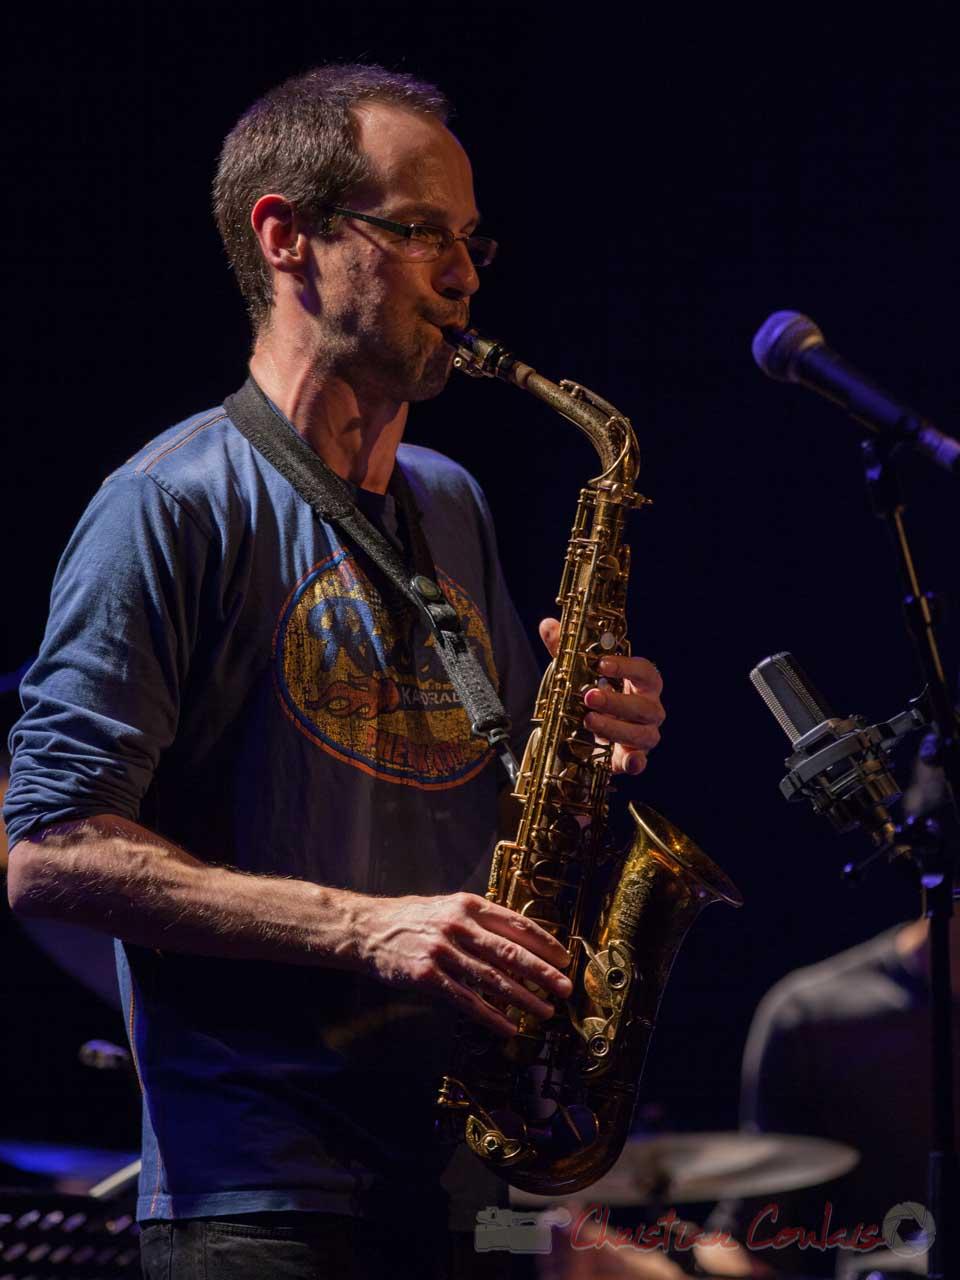 Julien Dubois, Festival JAZZ360 2016, Cénac, 10/06/2016 1/6G